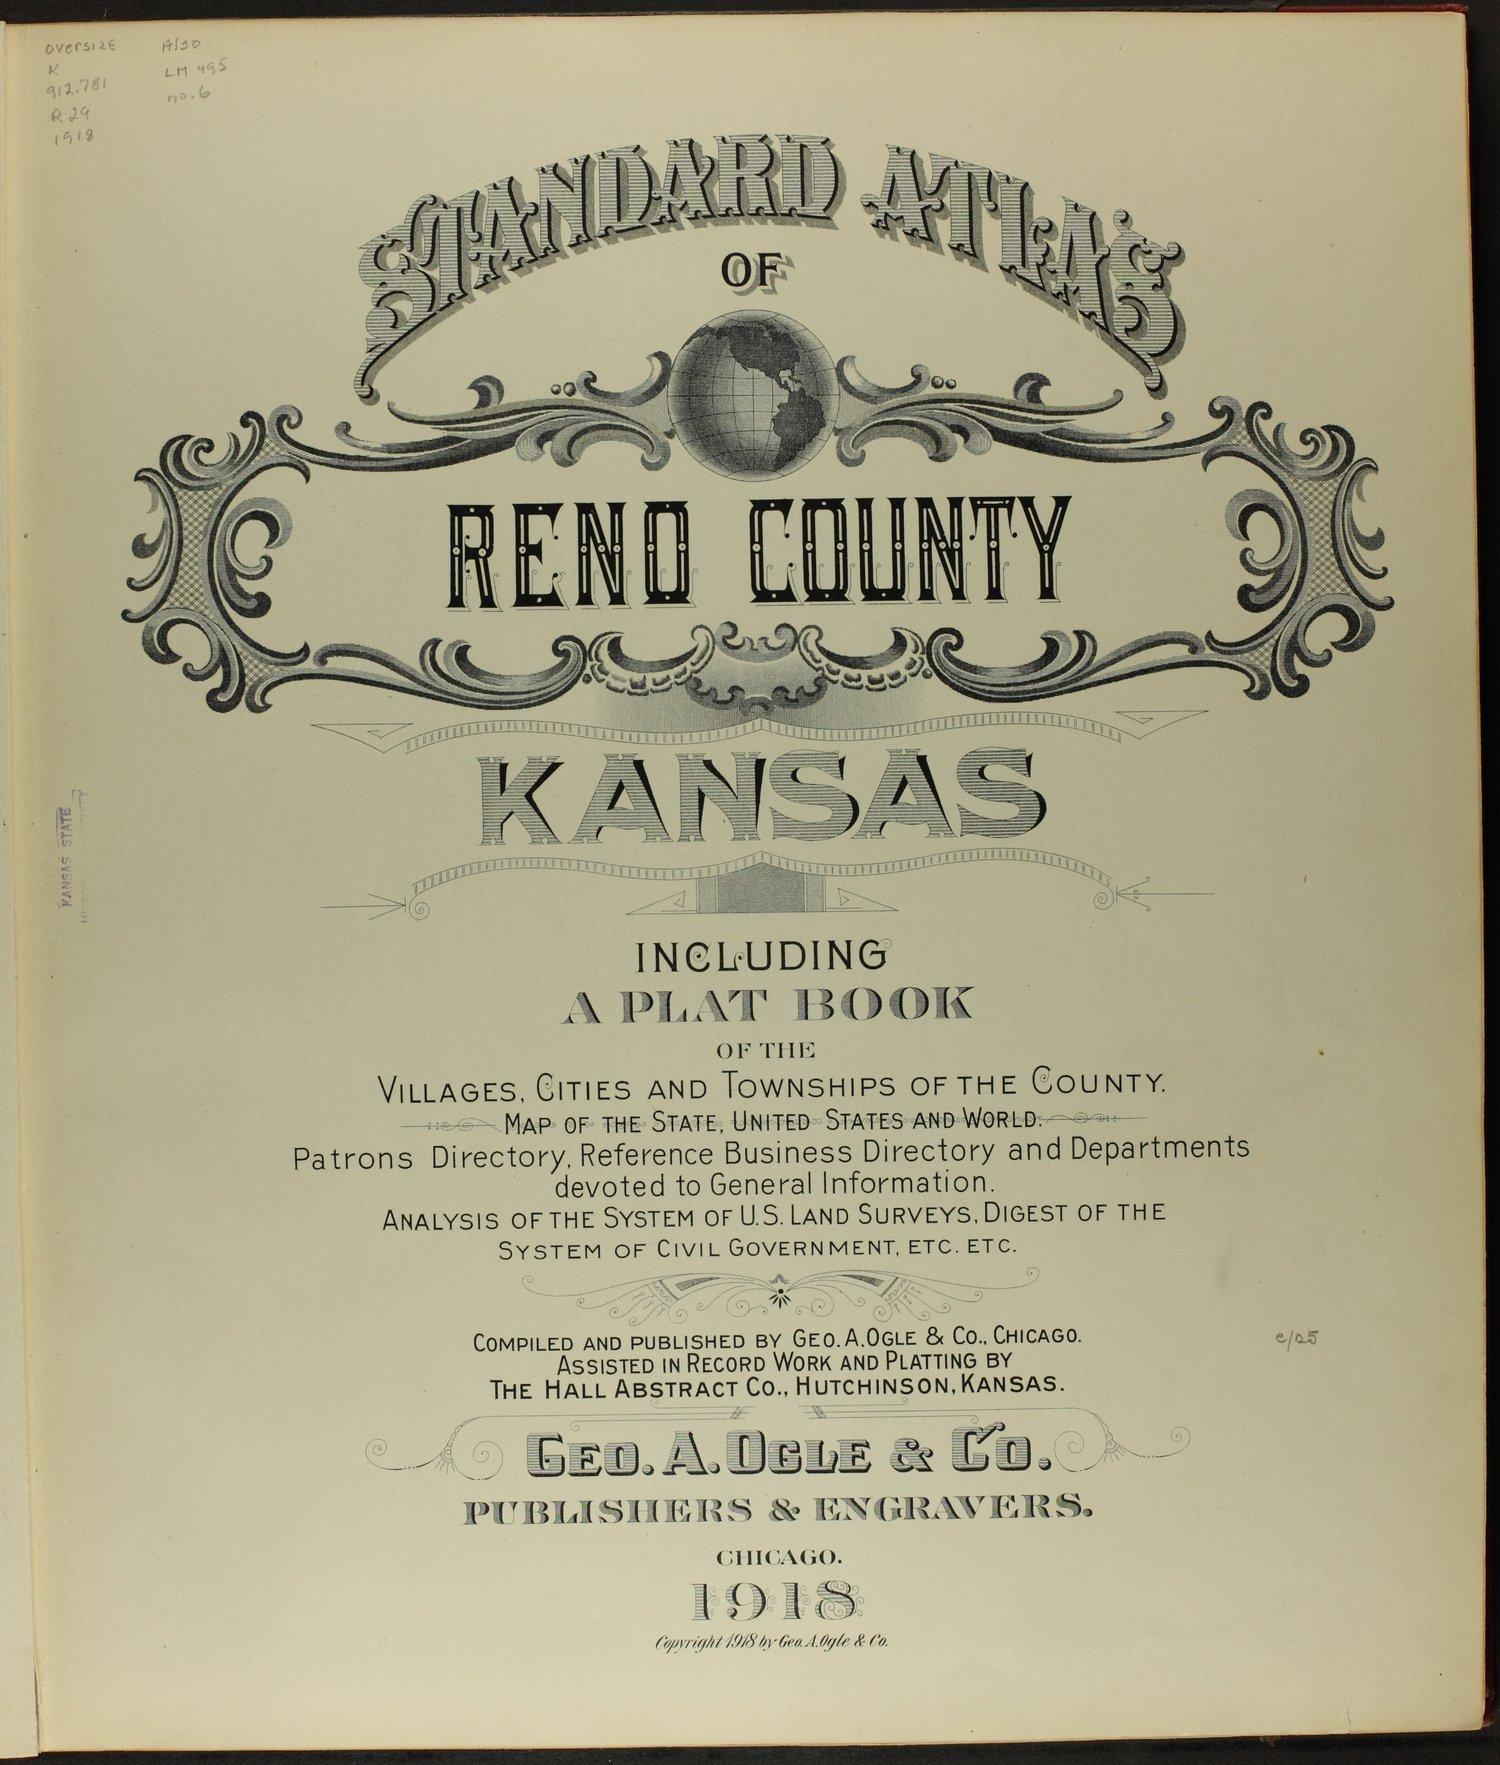 Standard atlas of Reno County, Kansas - Title Page